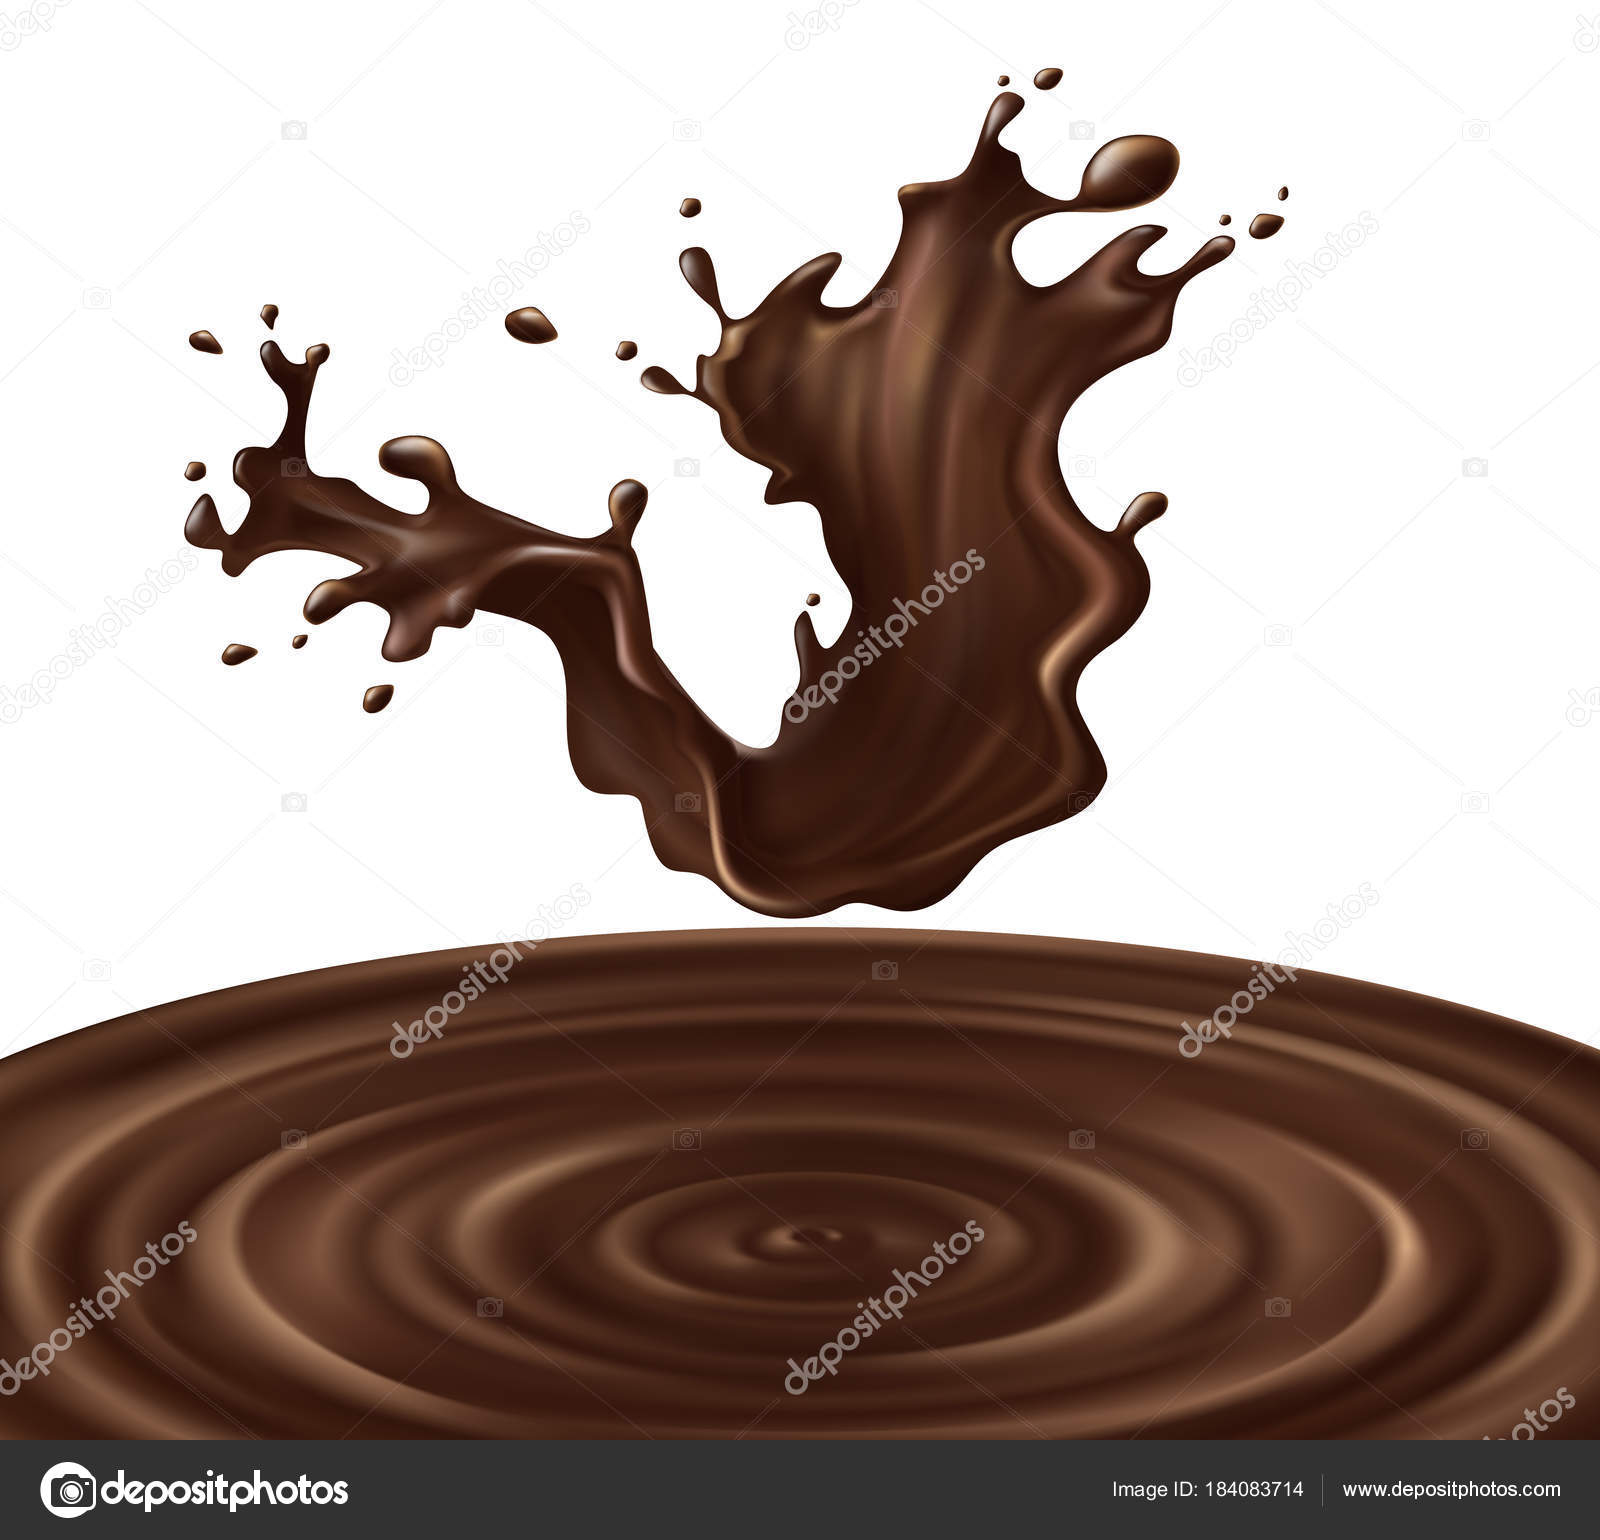 3d realistic chocolate splash vector illustration stock vector c vectorpocket 184083714 https depositphotos com 184083714 stock illustration 3d realistic chocolate splash vector html